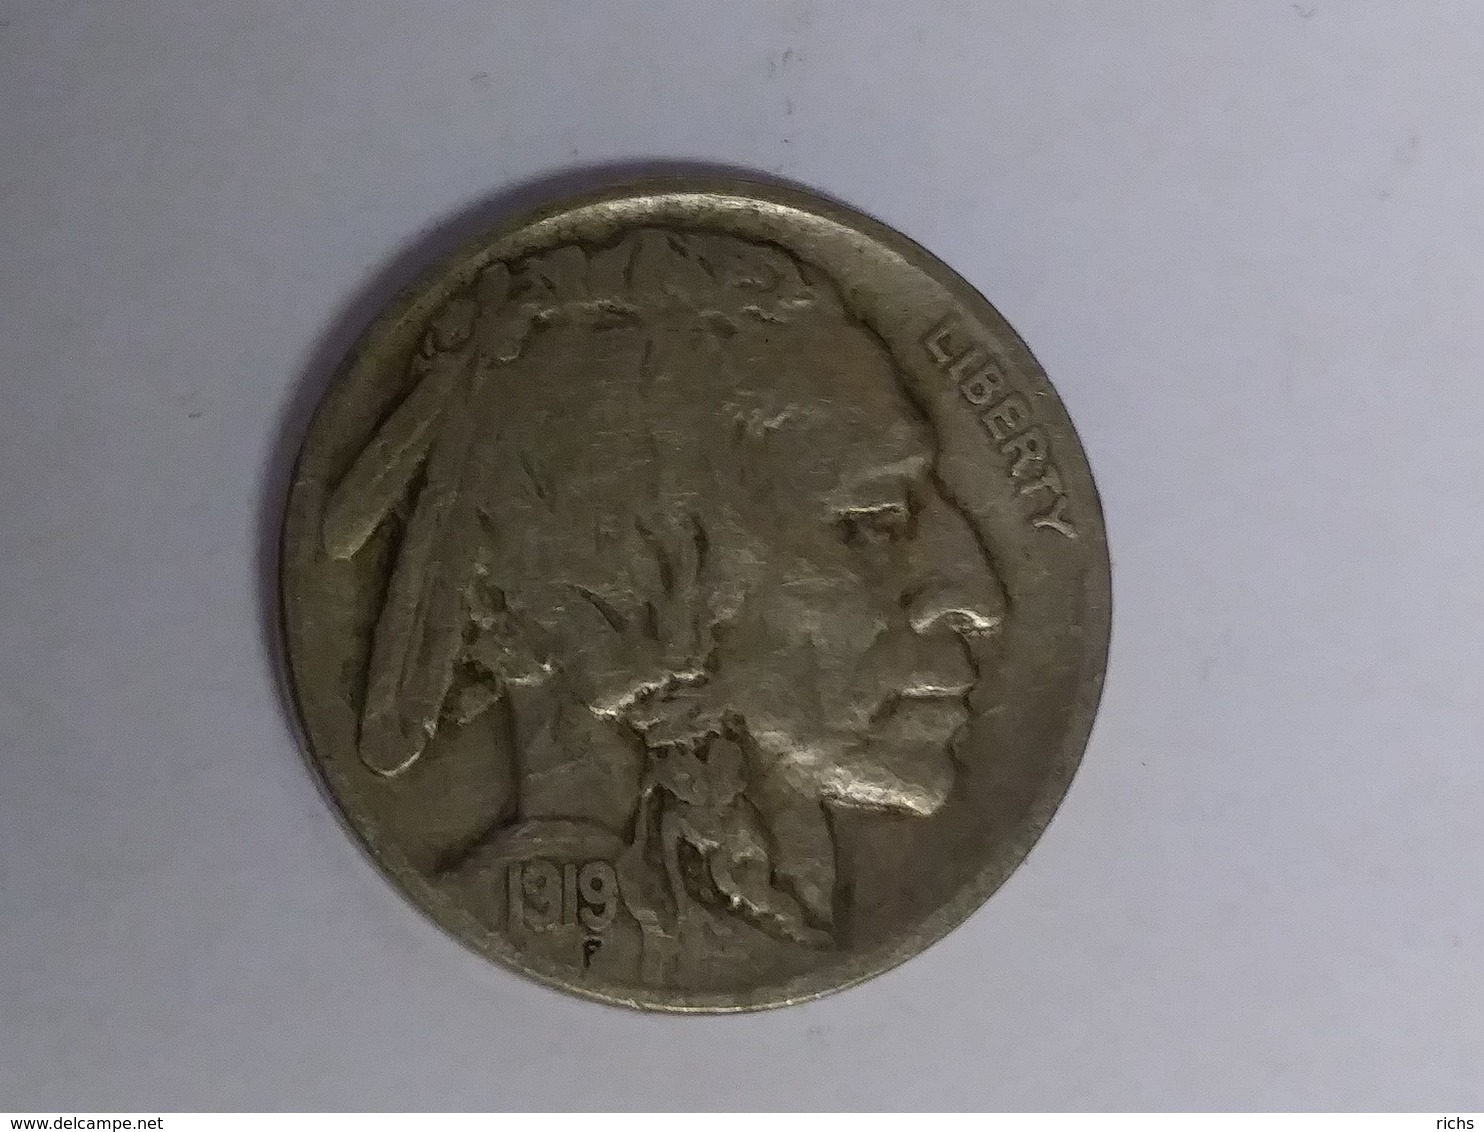 1919 Buffalo Nickel - Federal Issues